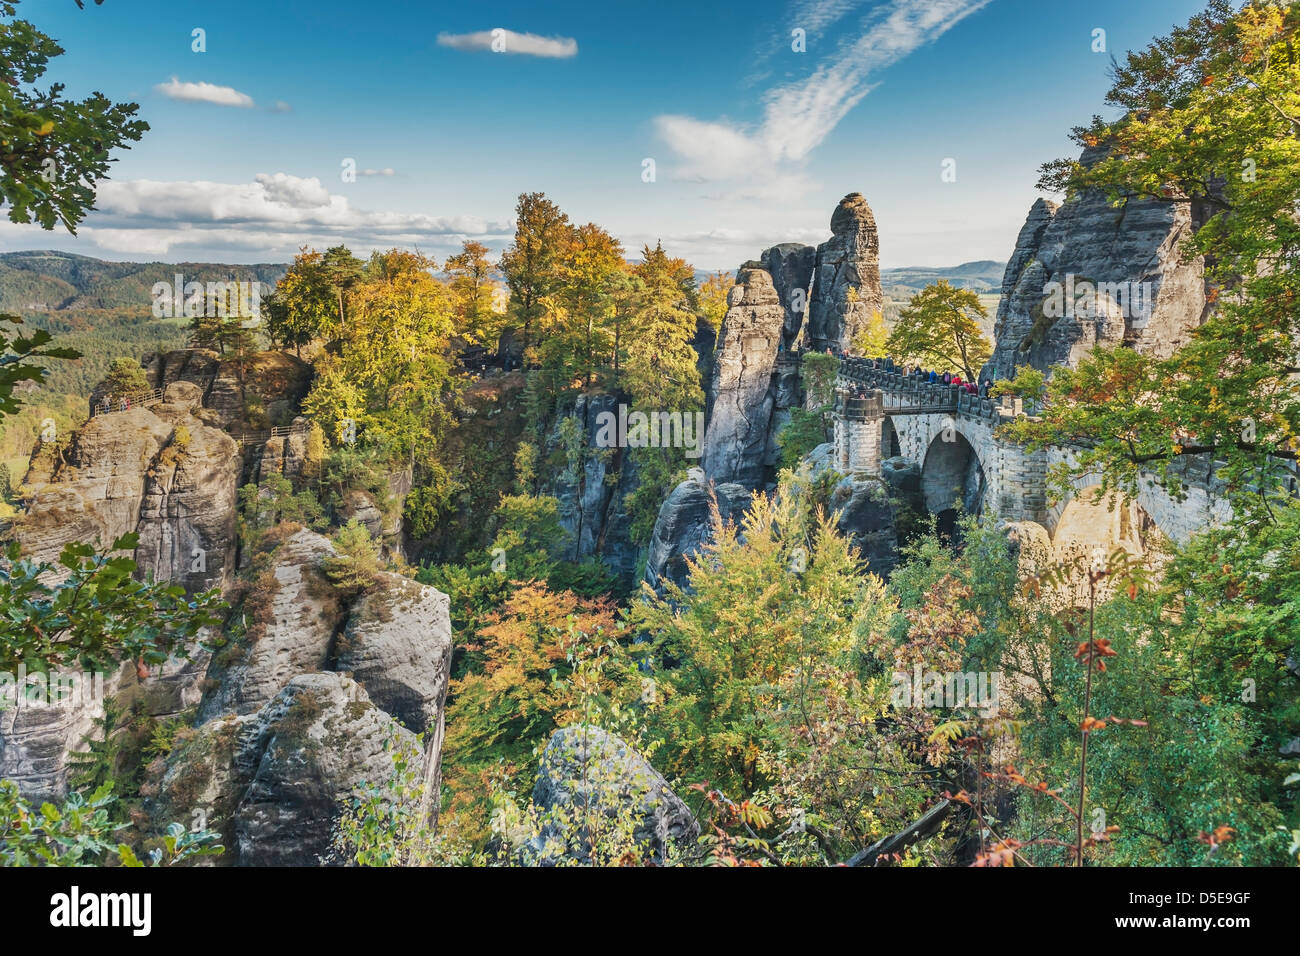 Rock formation Bastei (Bastion) and Bridge, Lohmen, Saxon Switzerland near Dresden, Saxony, Germany, Europe Stock Photo